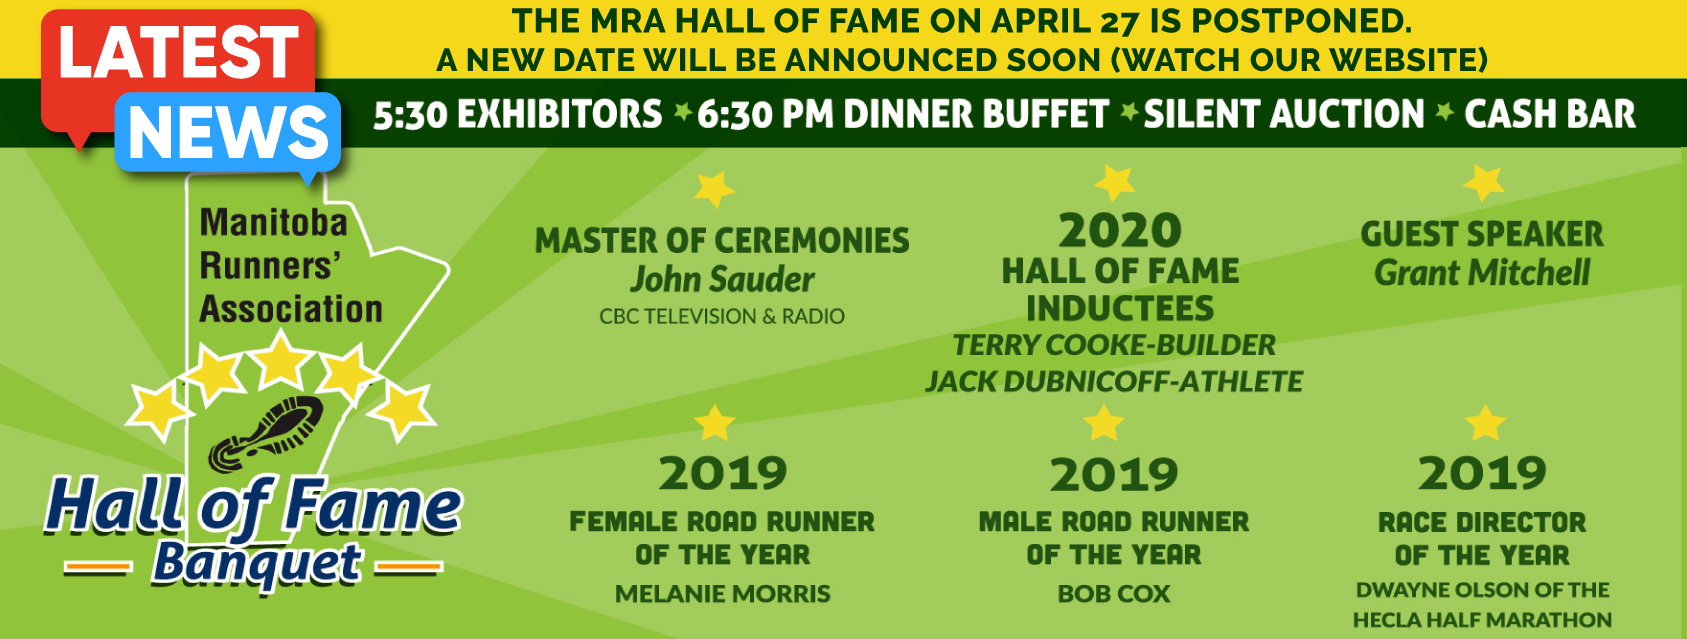 2020 MRA Hall of Fame Banquet - **POSTPONED TO APRIL, 2021**